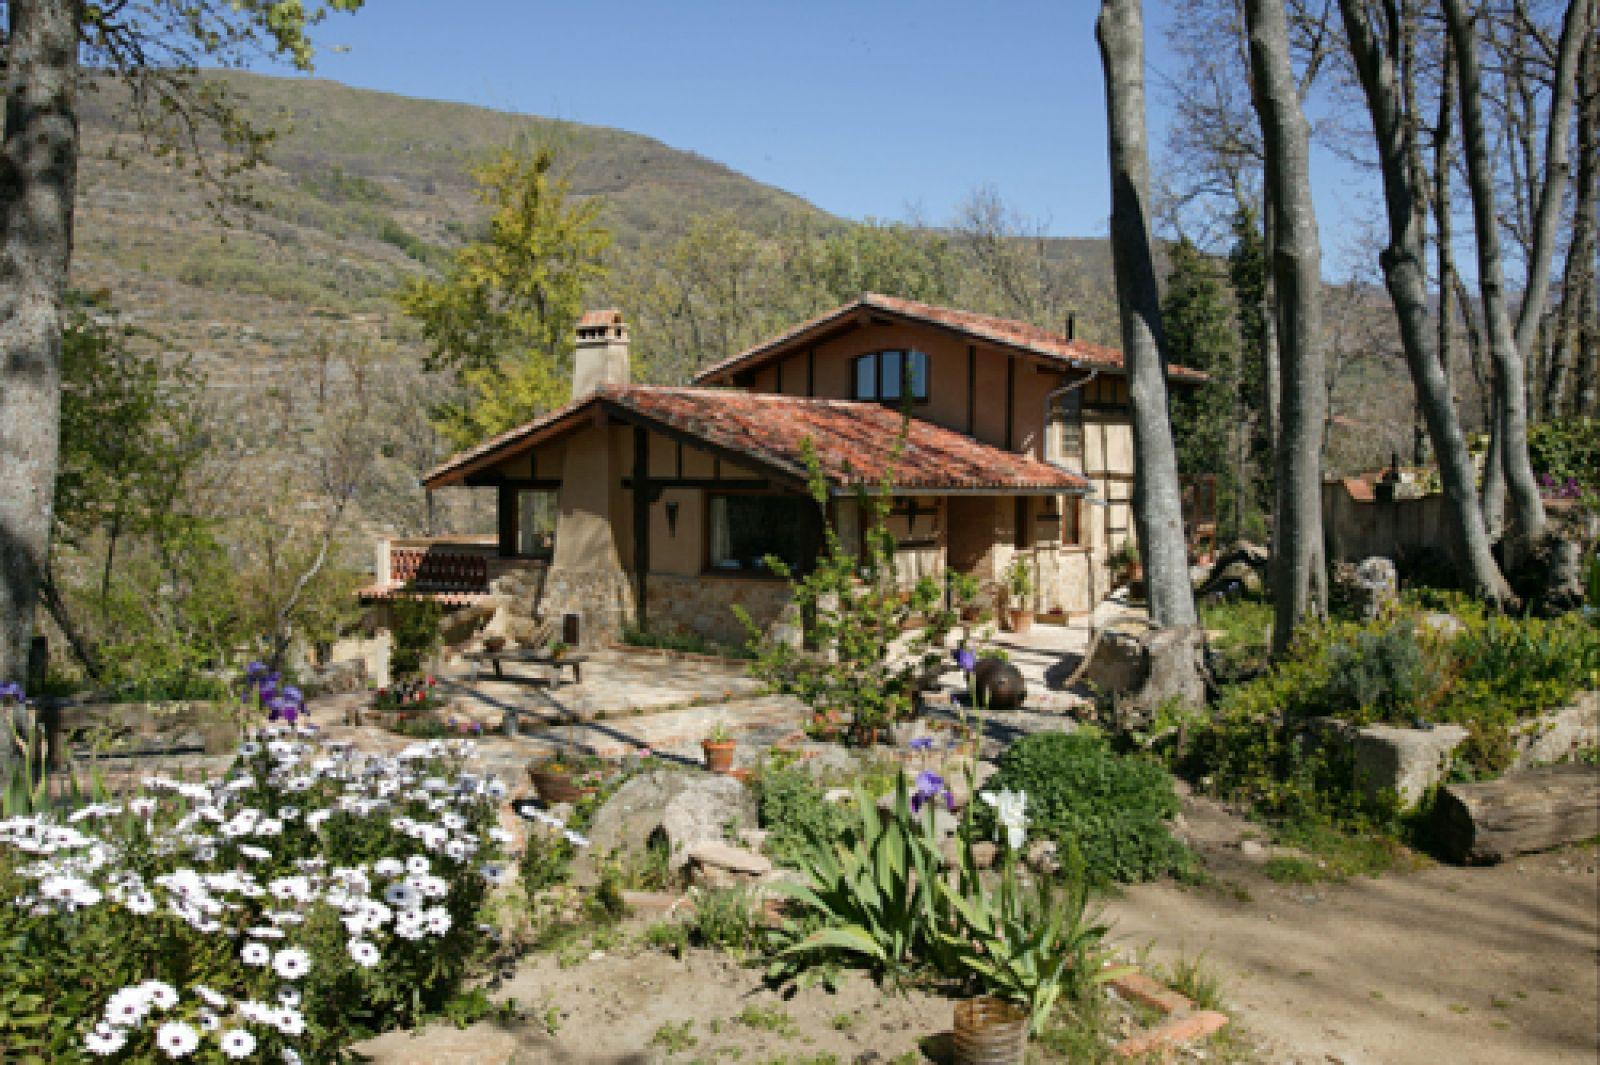 la casa rural del bosque